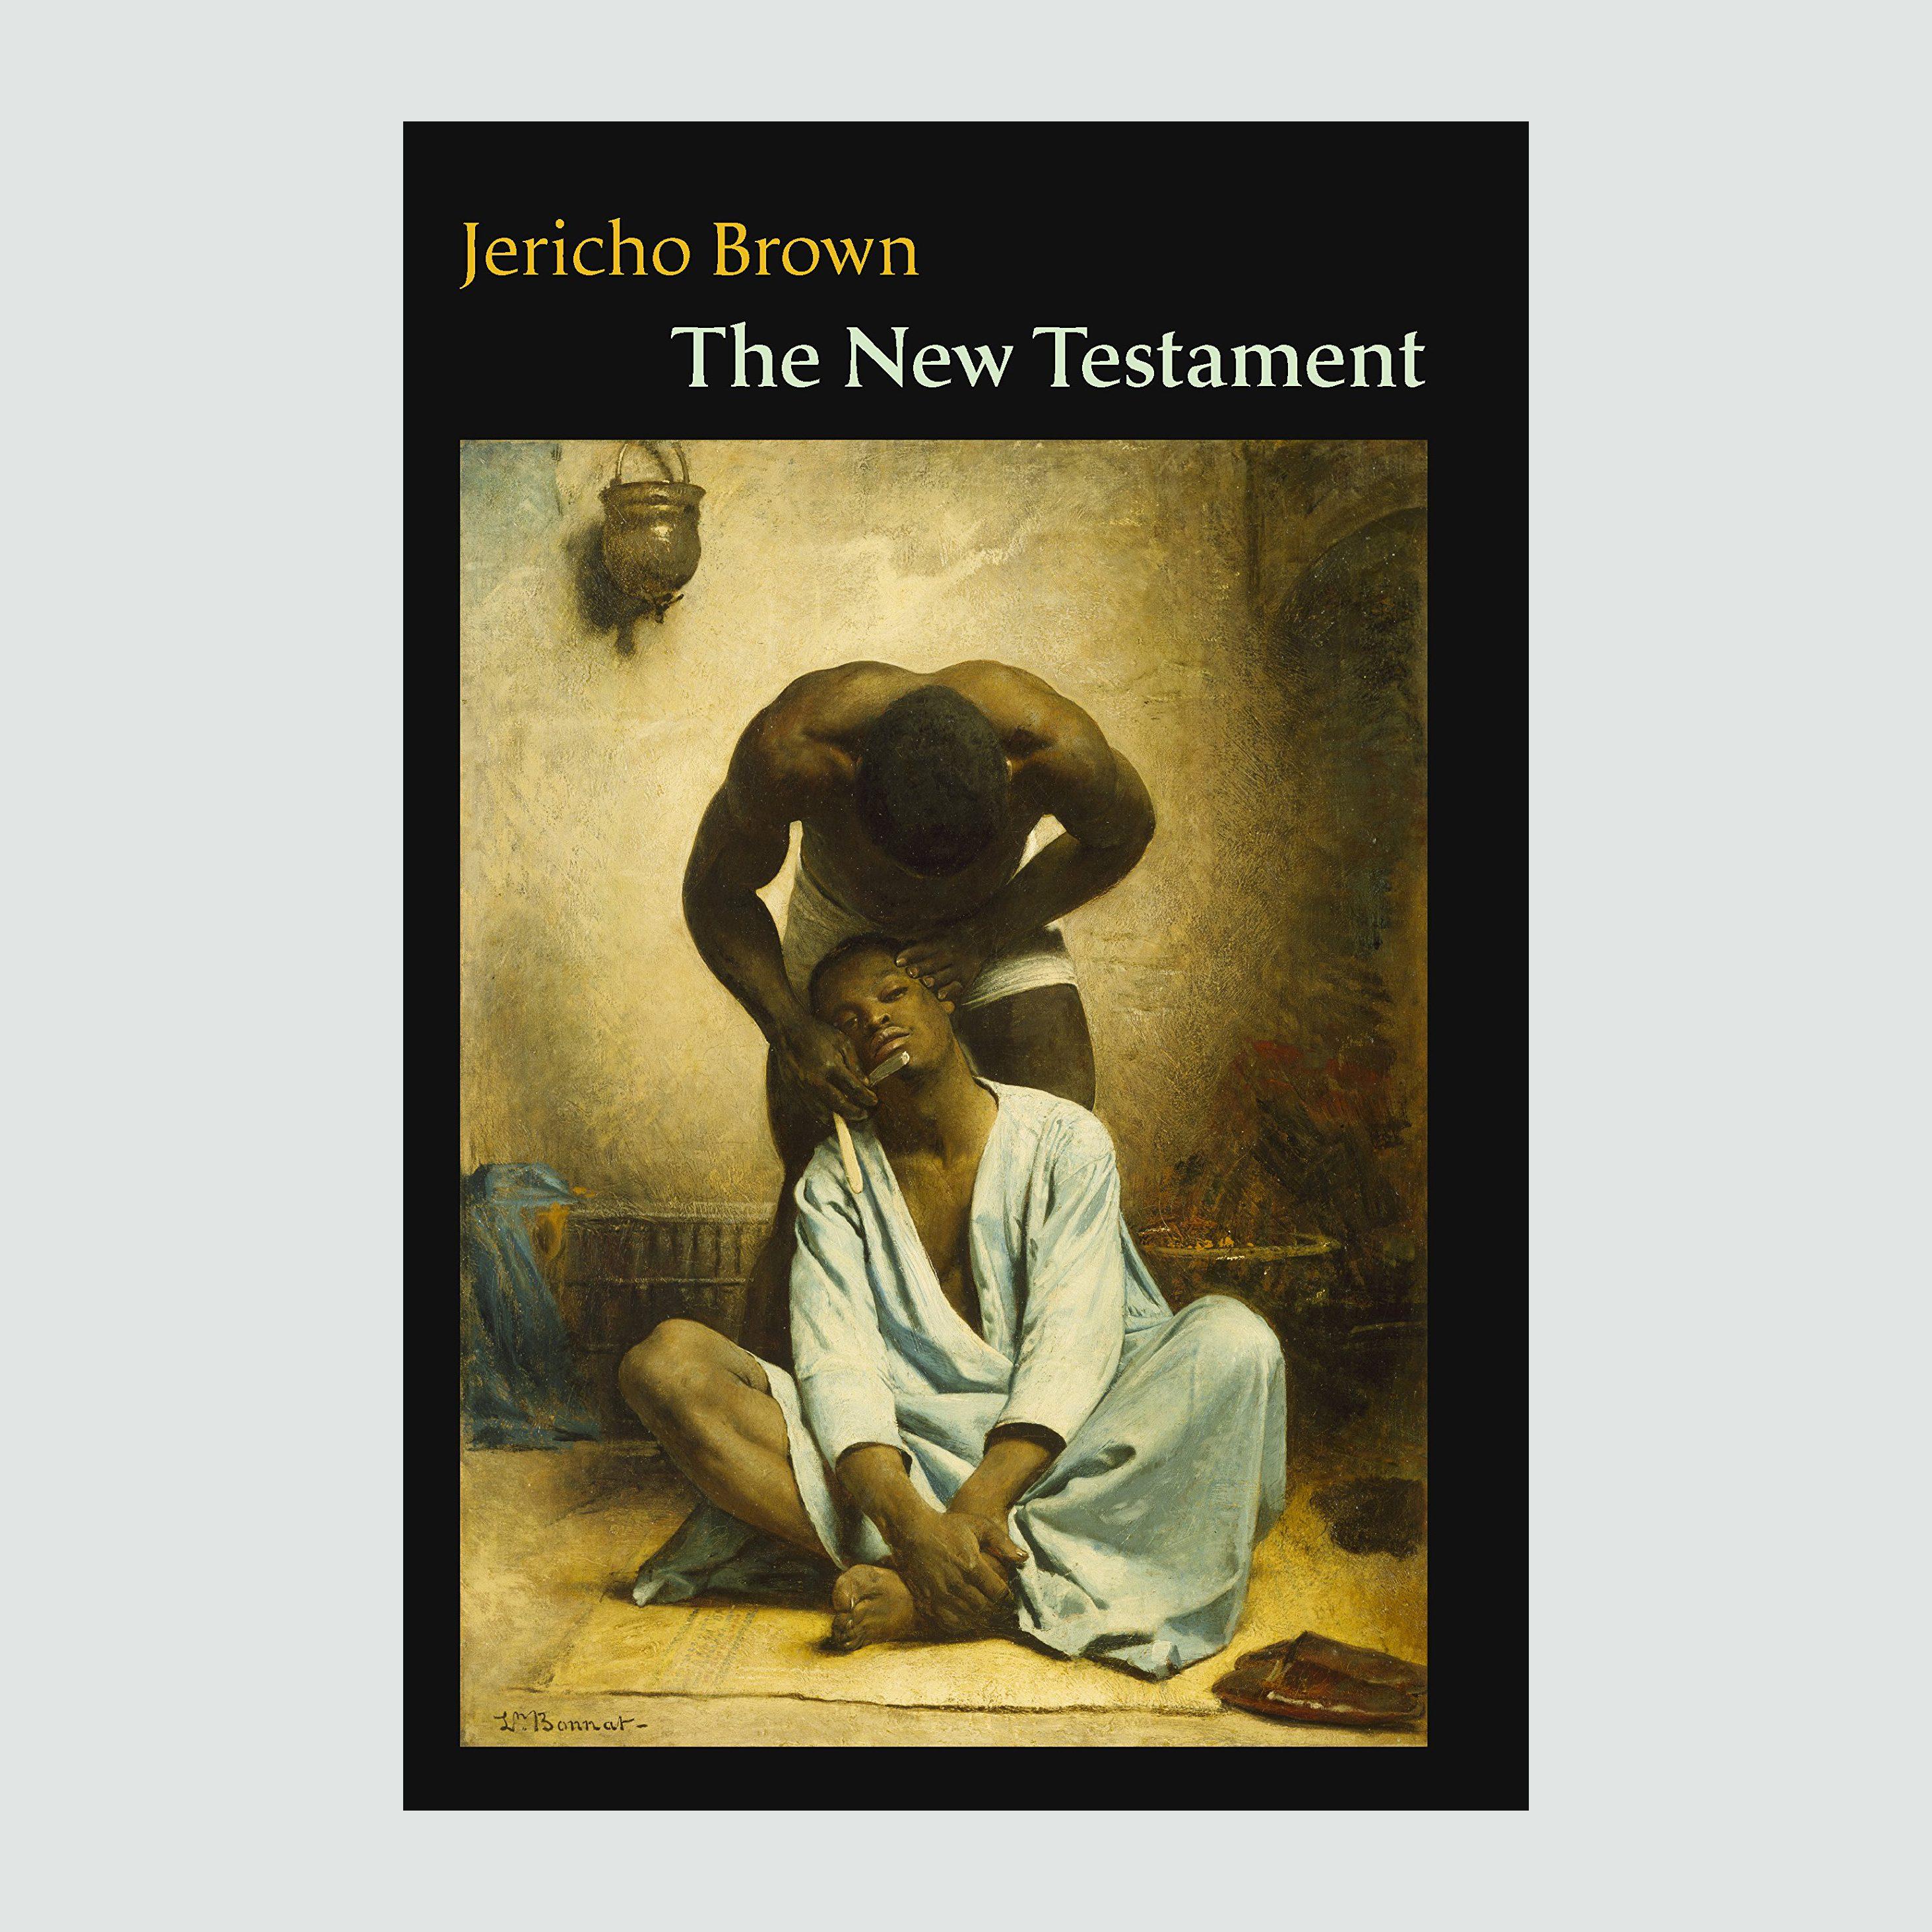 Jericho Brown author